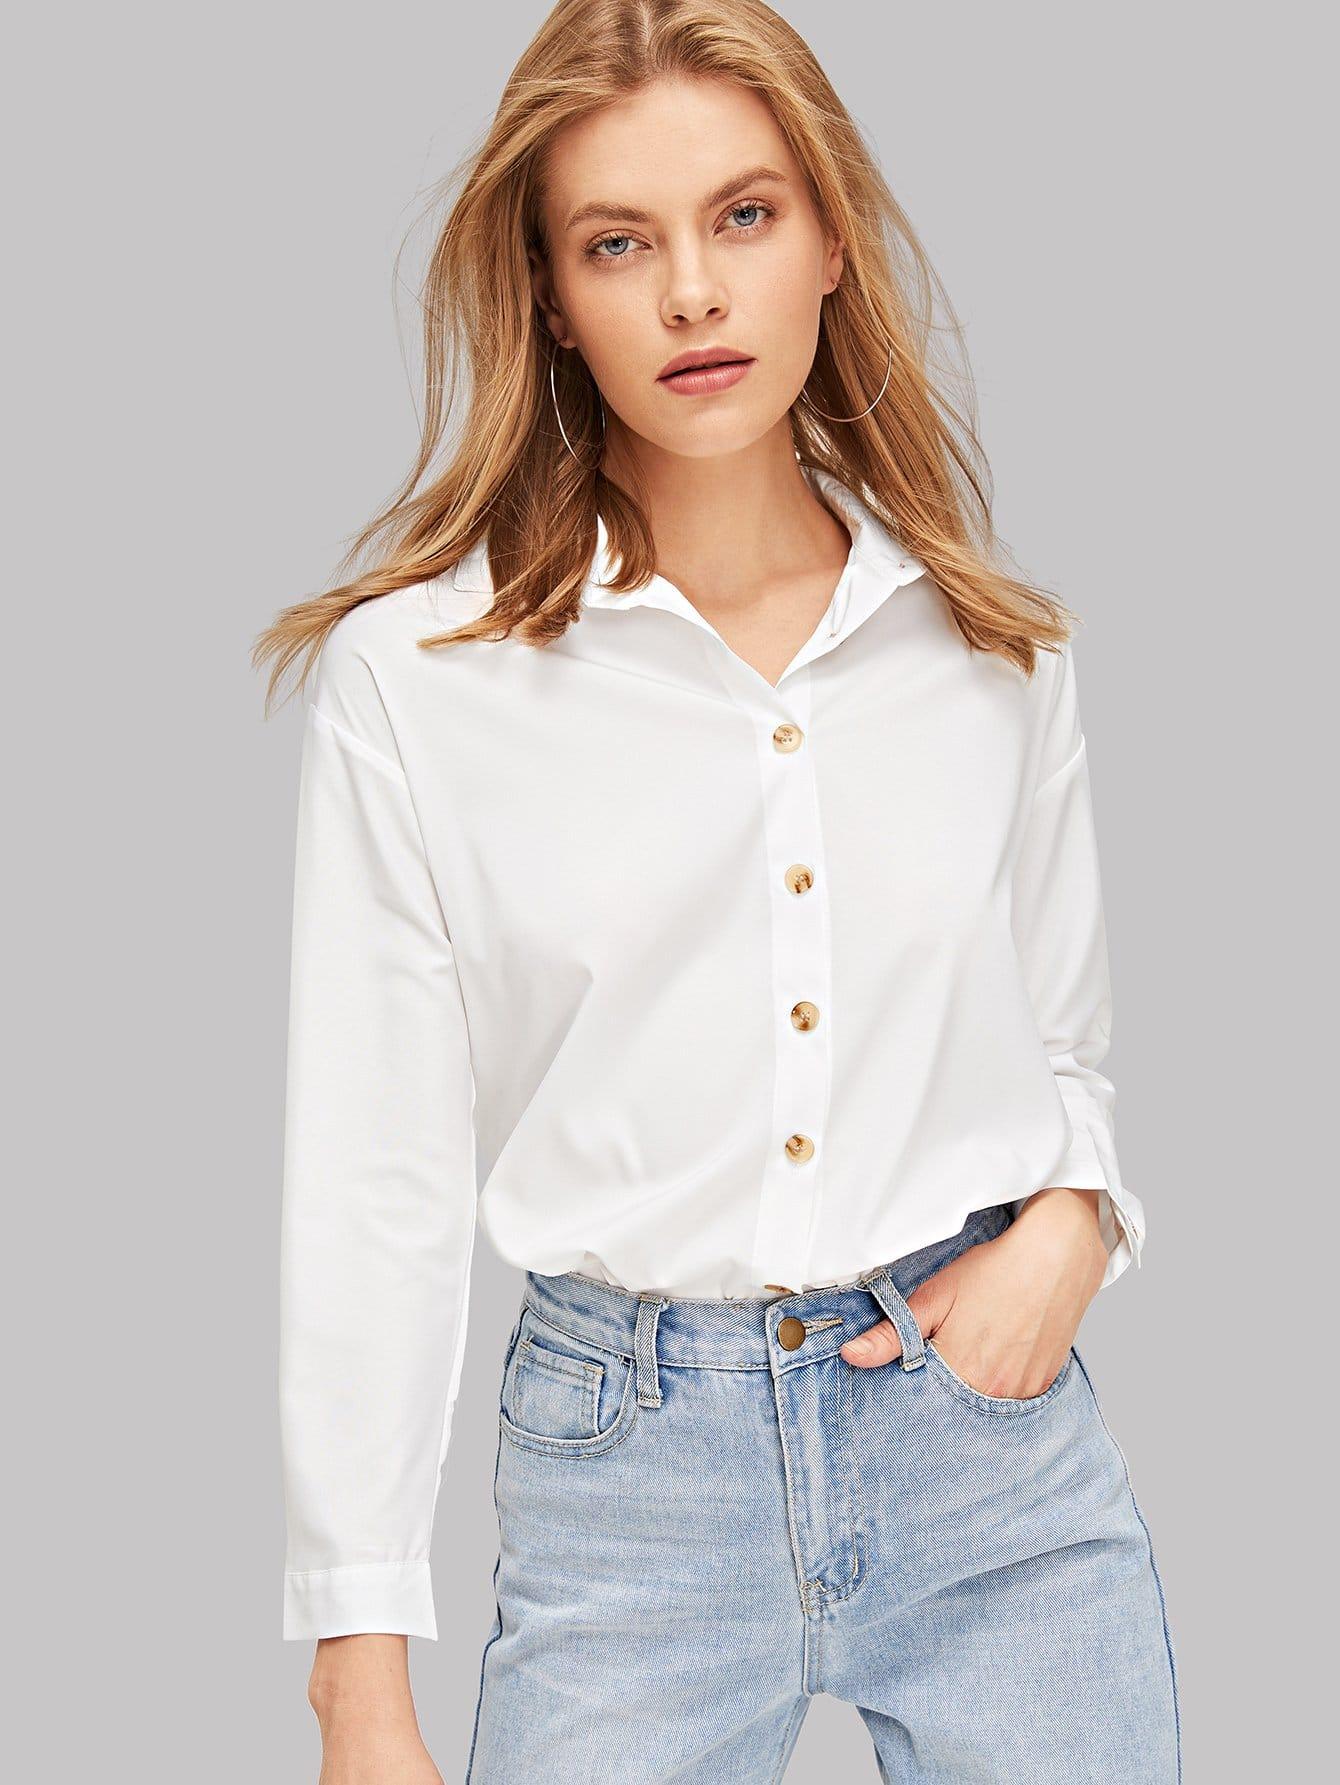 SHEINSolid Button Up Shirt